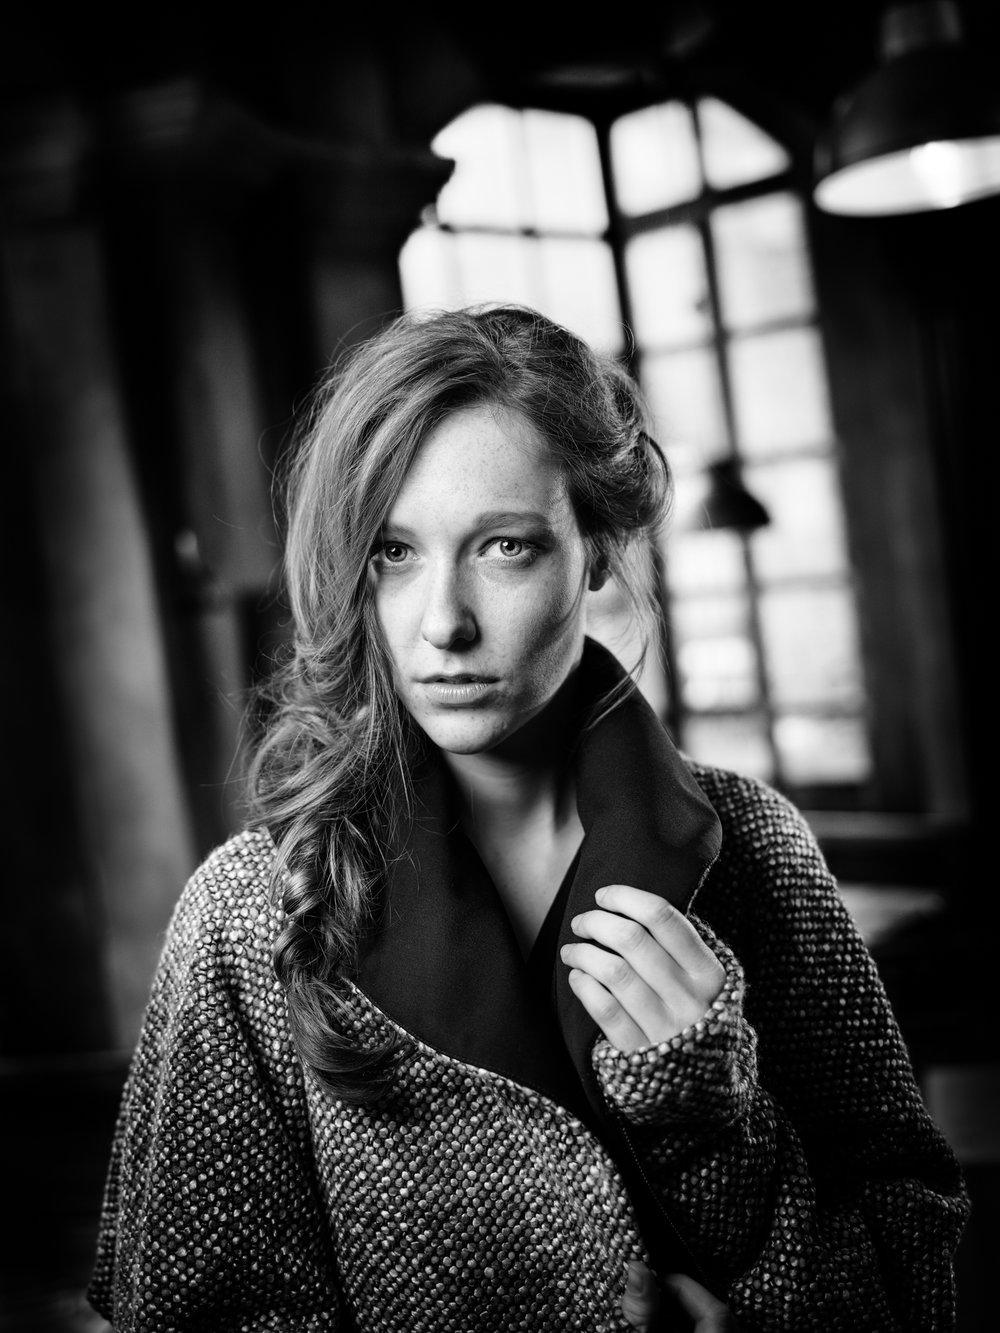 Leonie, time models